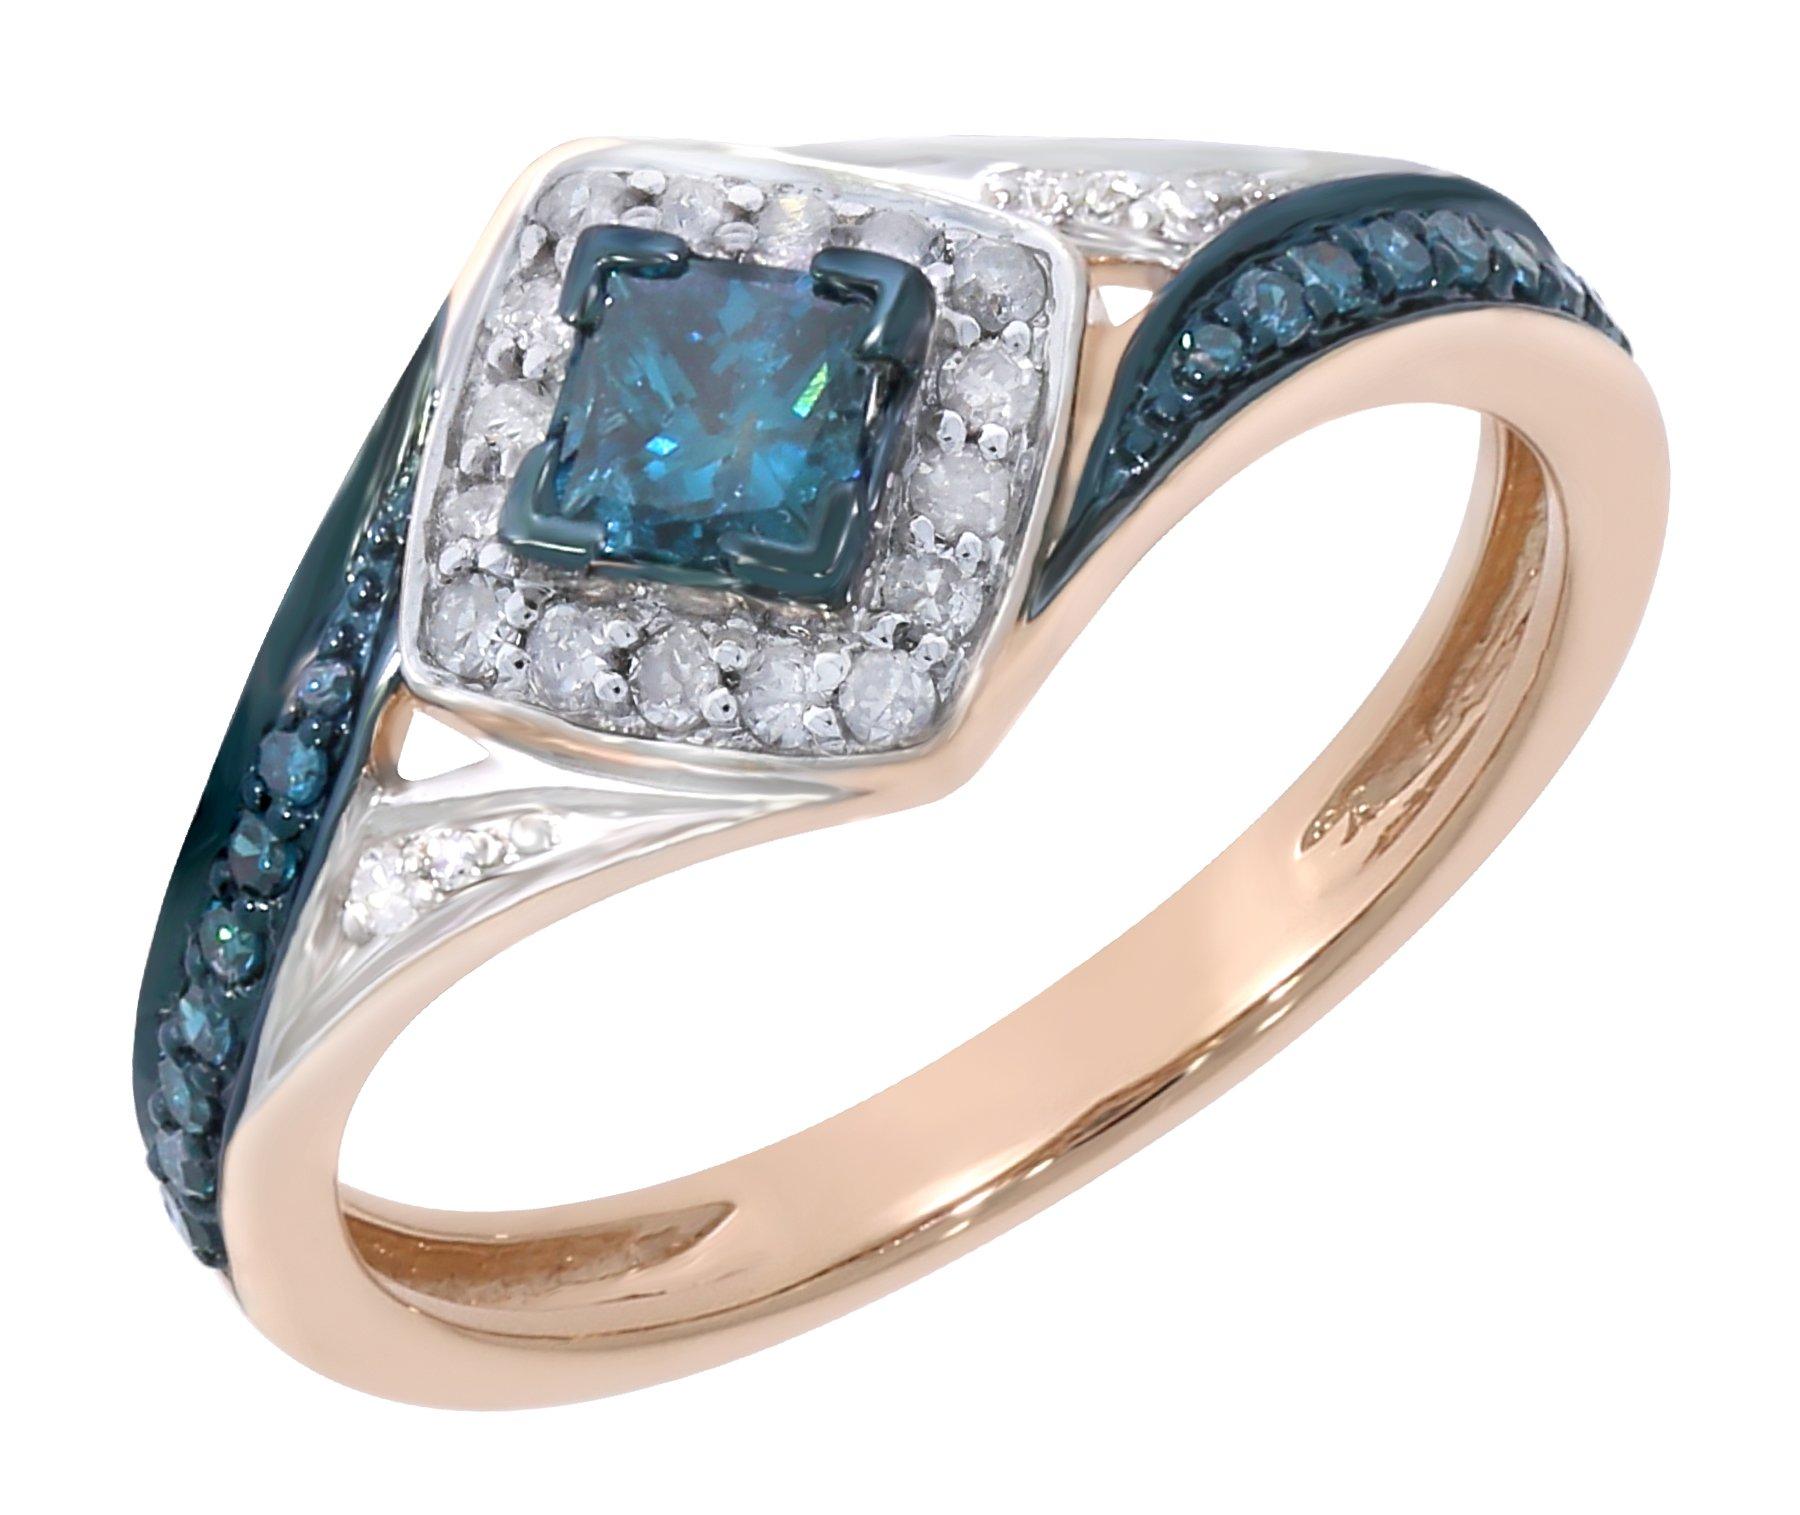 Prism Jewel 0.50Ct Princess & Round Shaped Blue Diamond & Diamond Engagement Ring, 10k Rose Gold Size 6